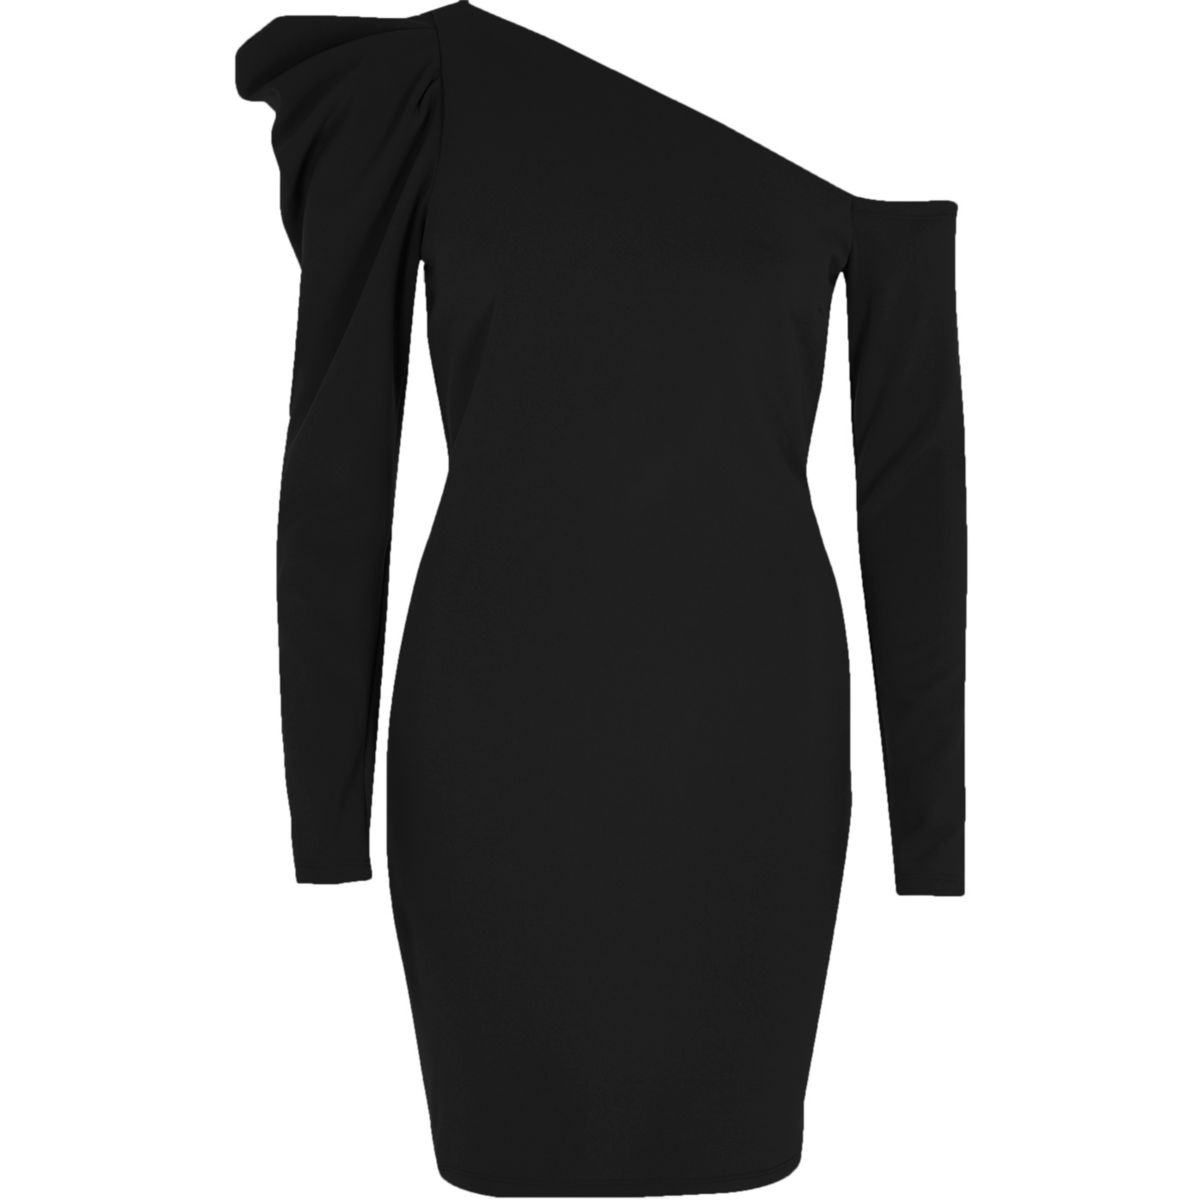 Black one shoulder puff sleeve bodycon dress